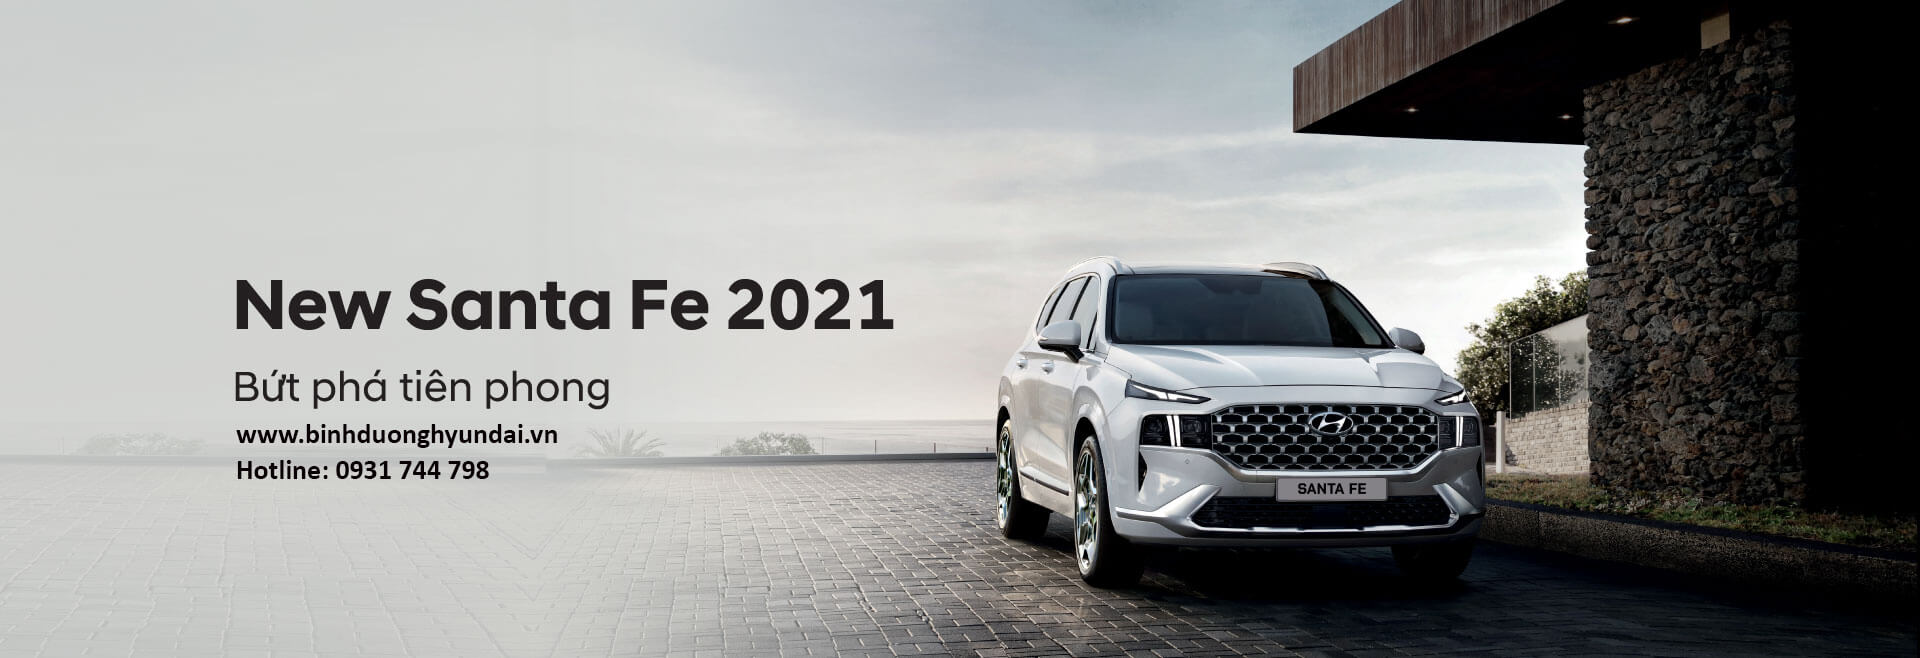 Hyundai Santa Fe 2021 tại Hyundai Bình Dương